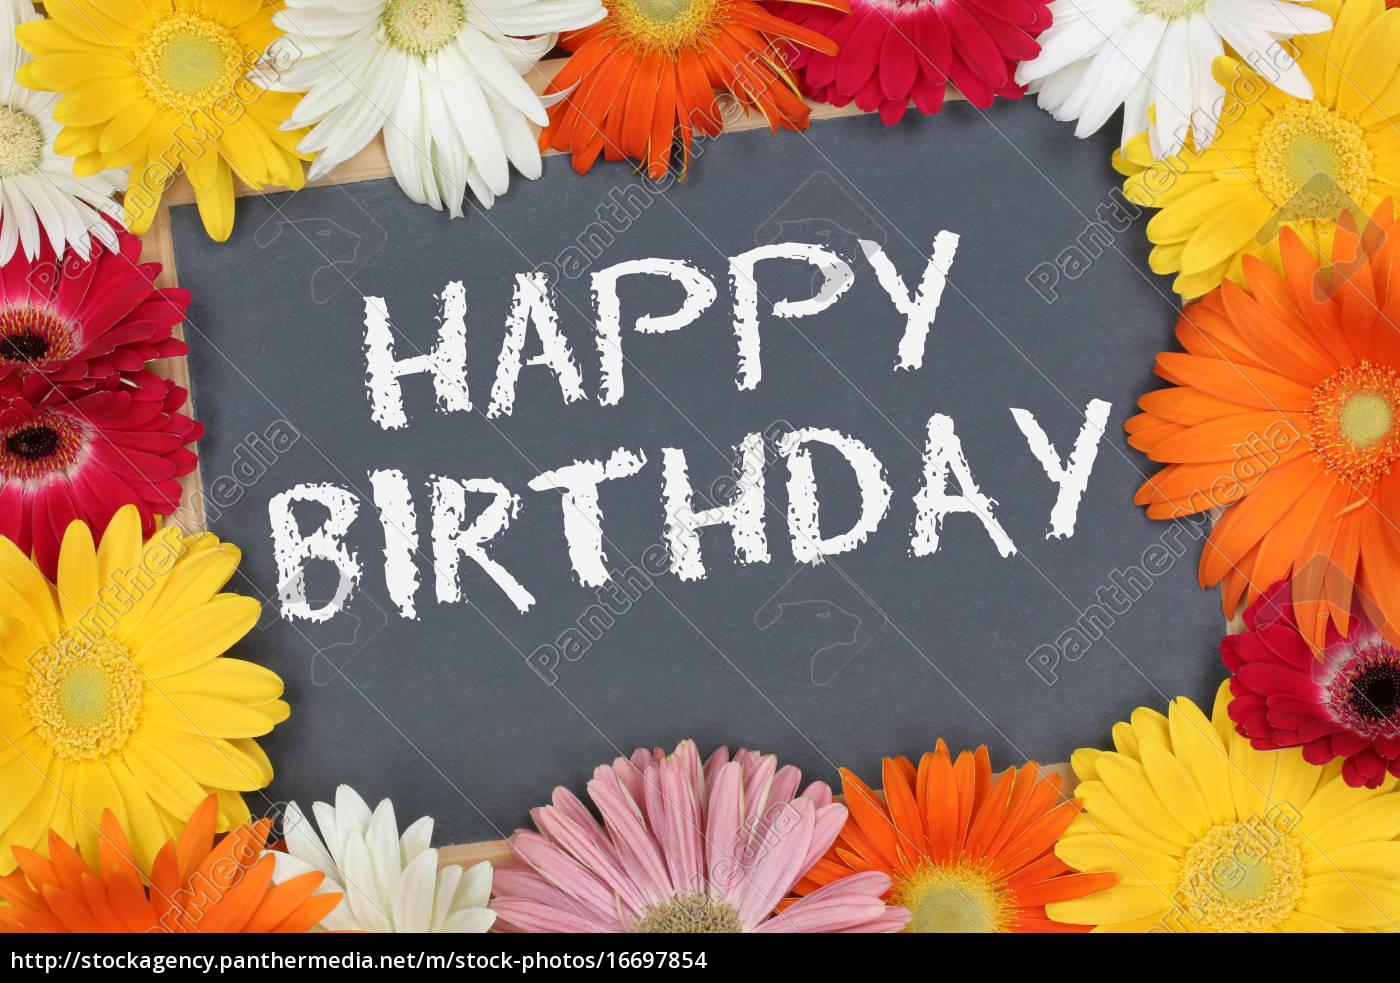 Stock Bild 16697854 - Happy Birthday Geburtstag Karte Geburtstagskarte Mit  Bunten ganzes Geburtstagskarte Geburtstag